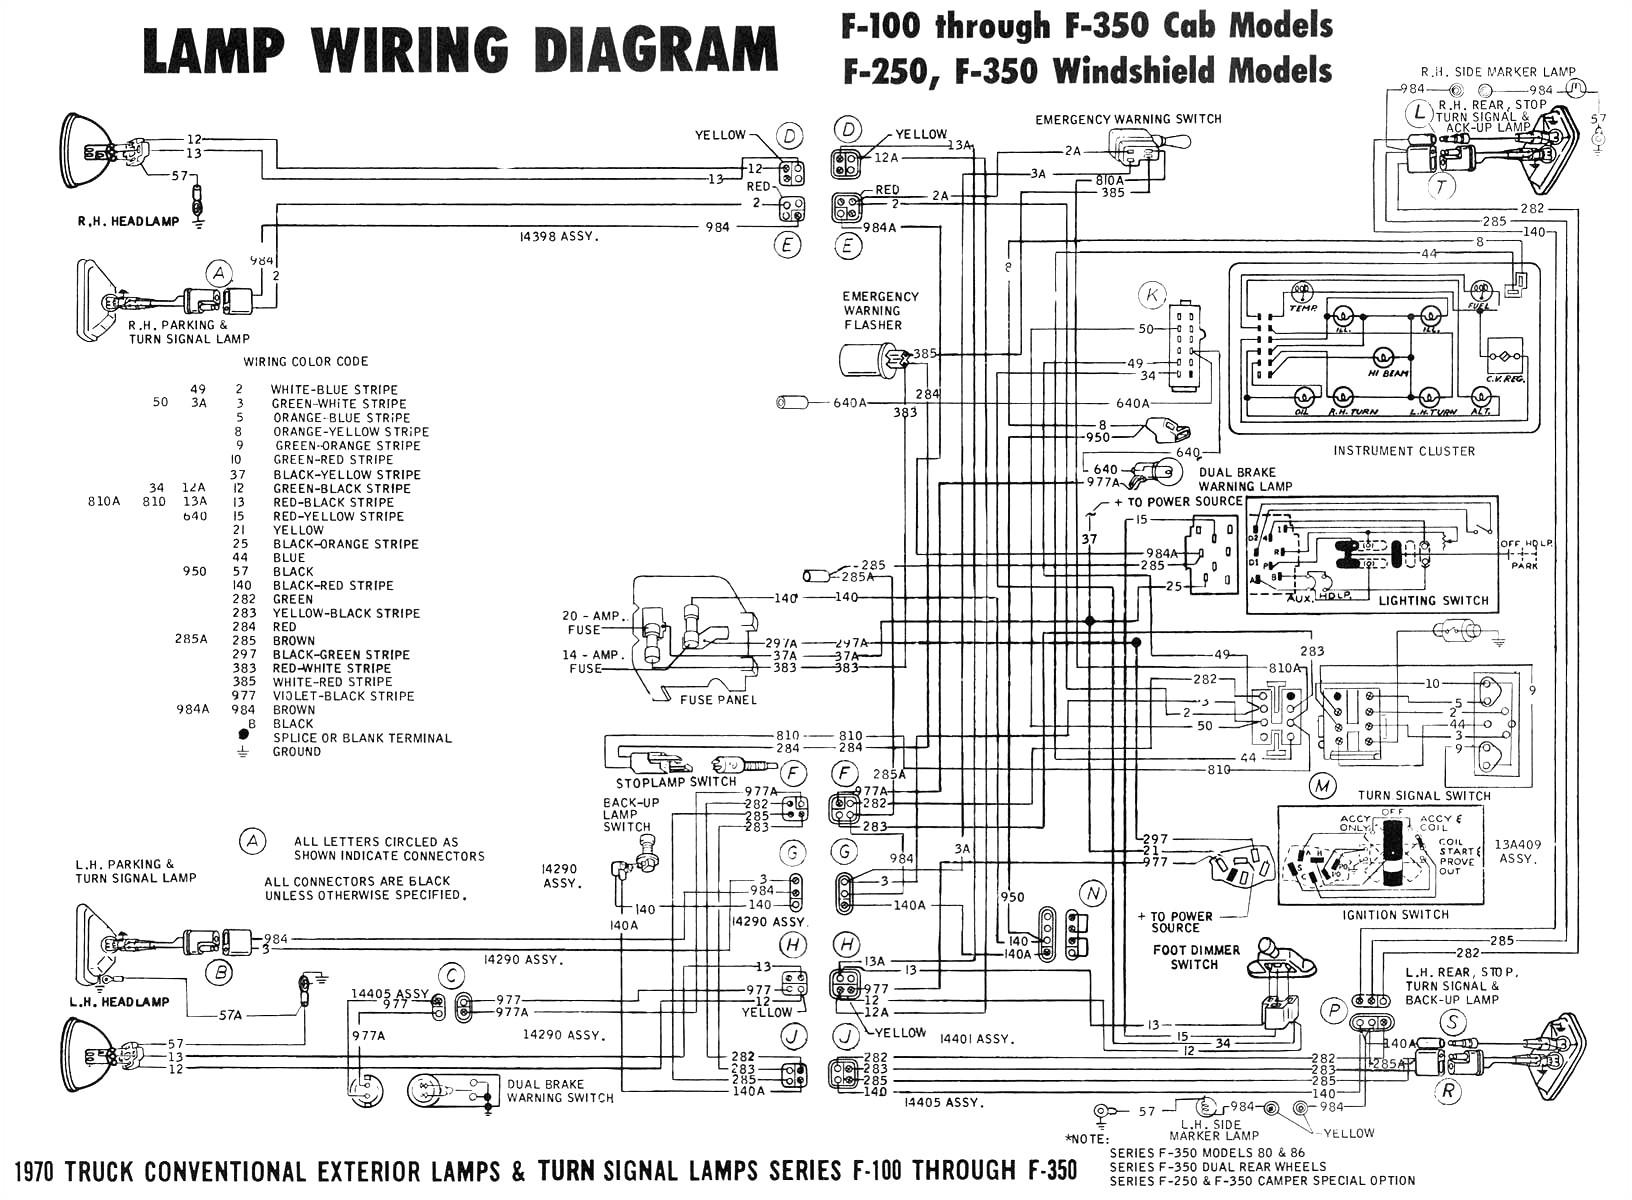 vdo tachometer wiring diagram yanmar generator wiring diagram valid rh electricwiringdiagram co sunpro tach wiring diagram